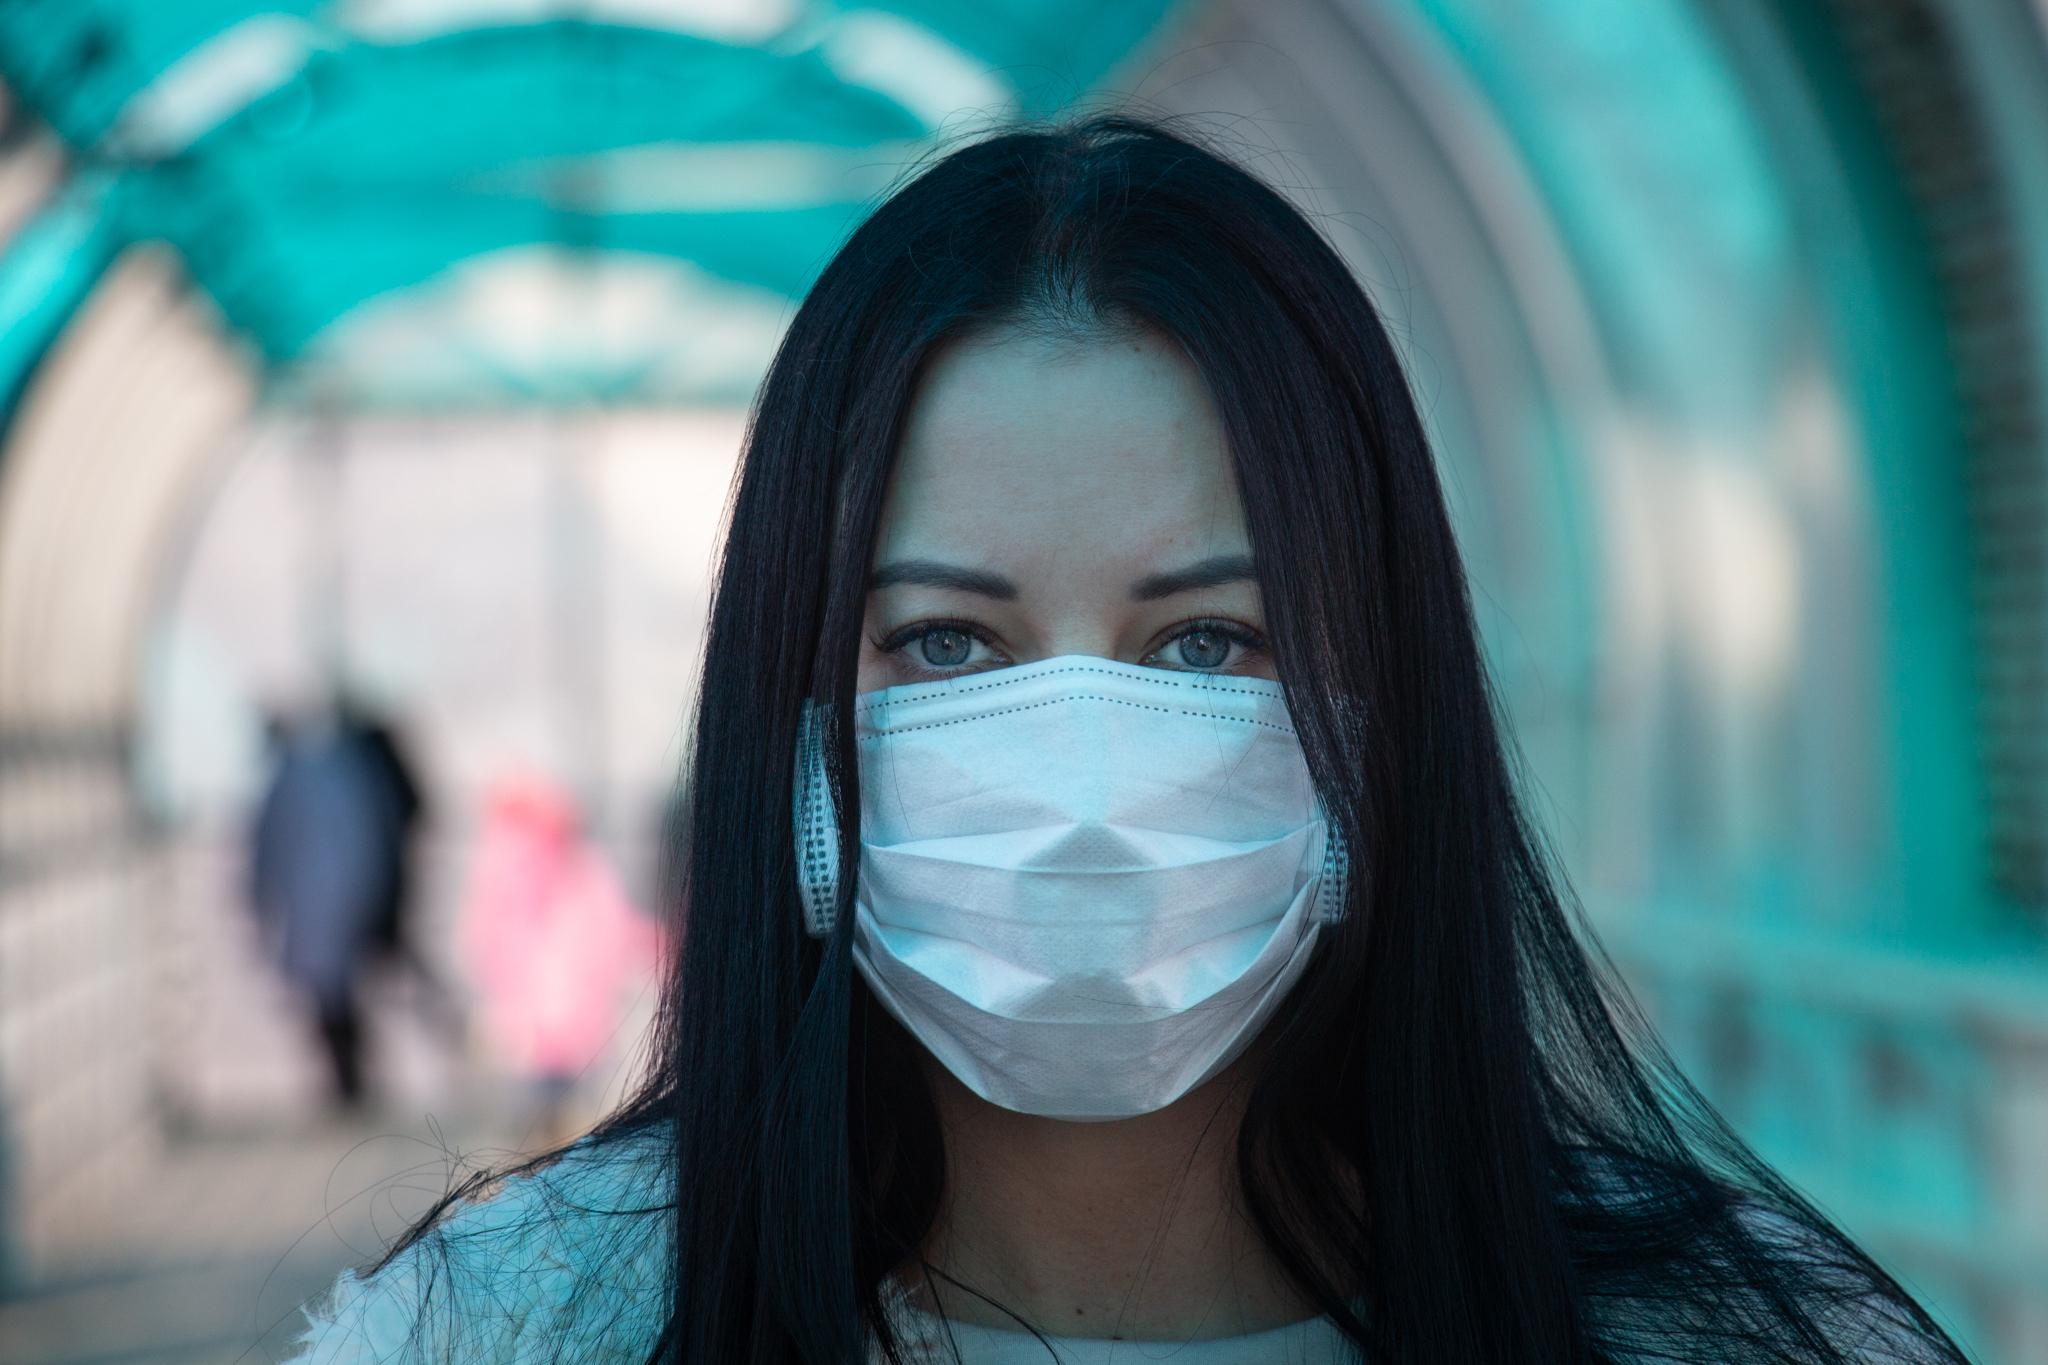 COVID 19 Coronavirus Girl in mask